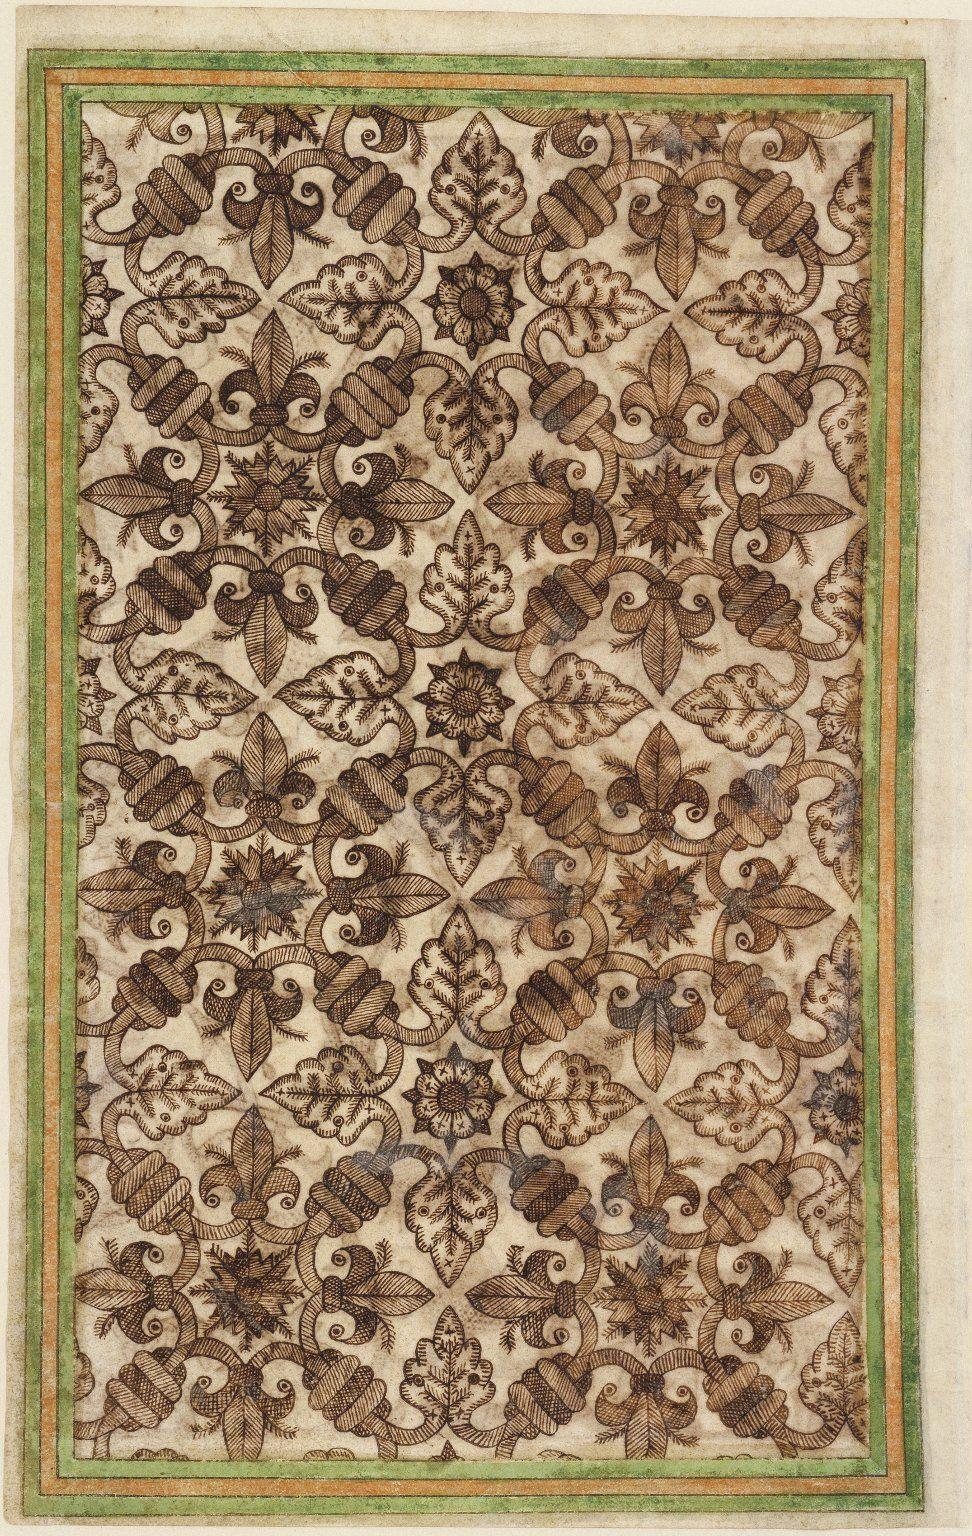 Thomas trevelyon miscellany biomorphic patterns pinterest